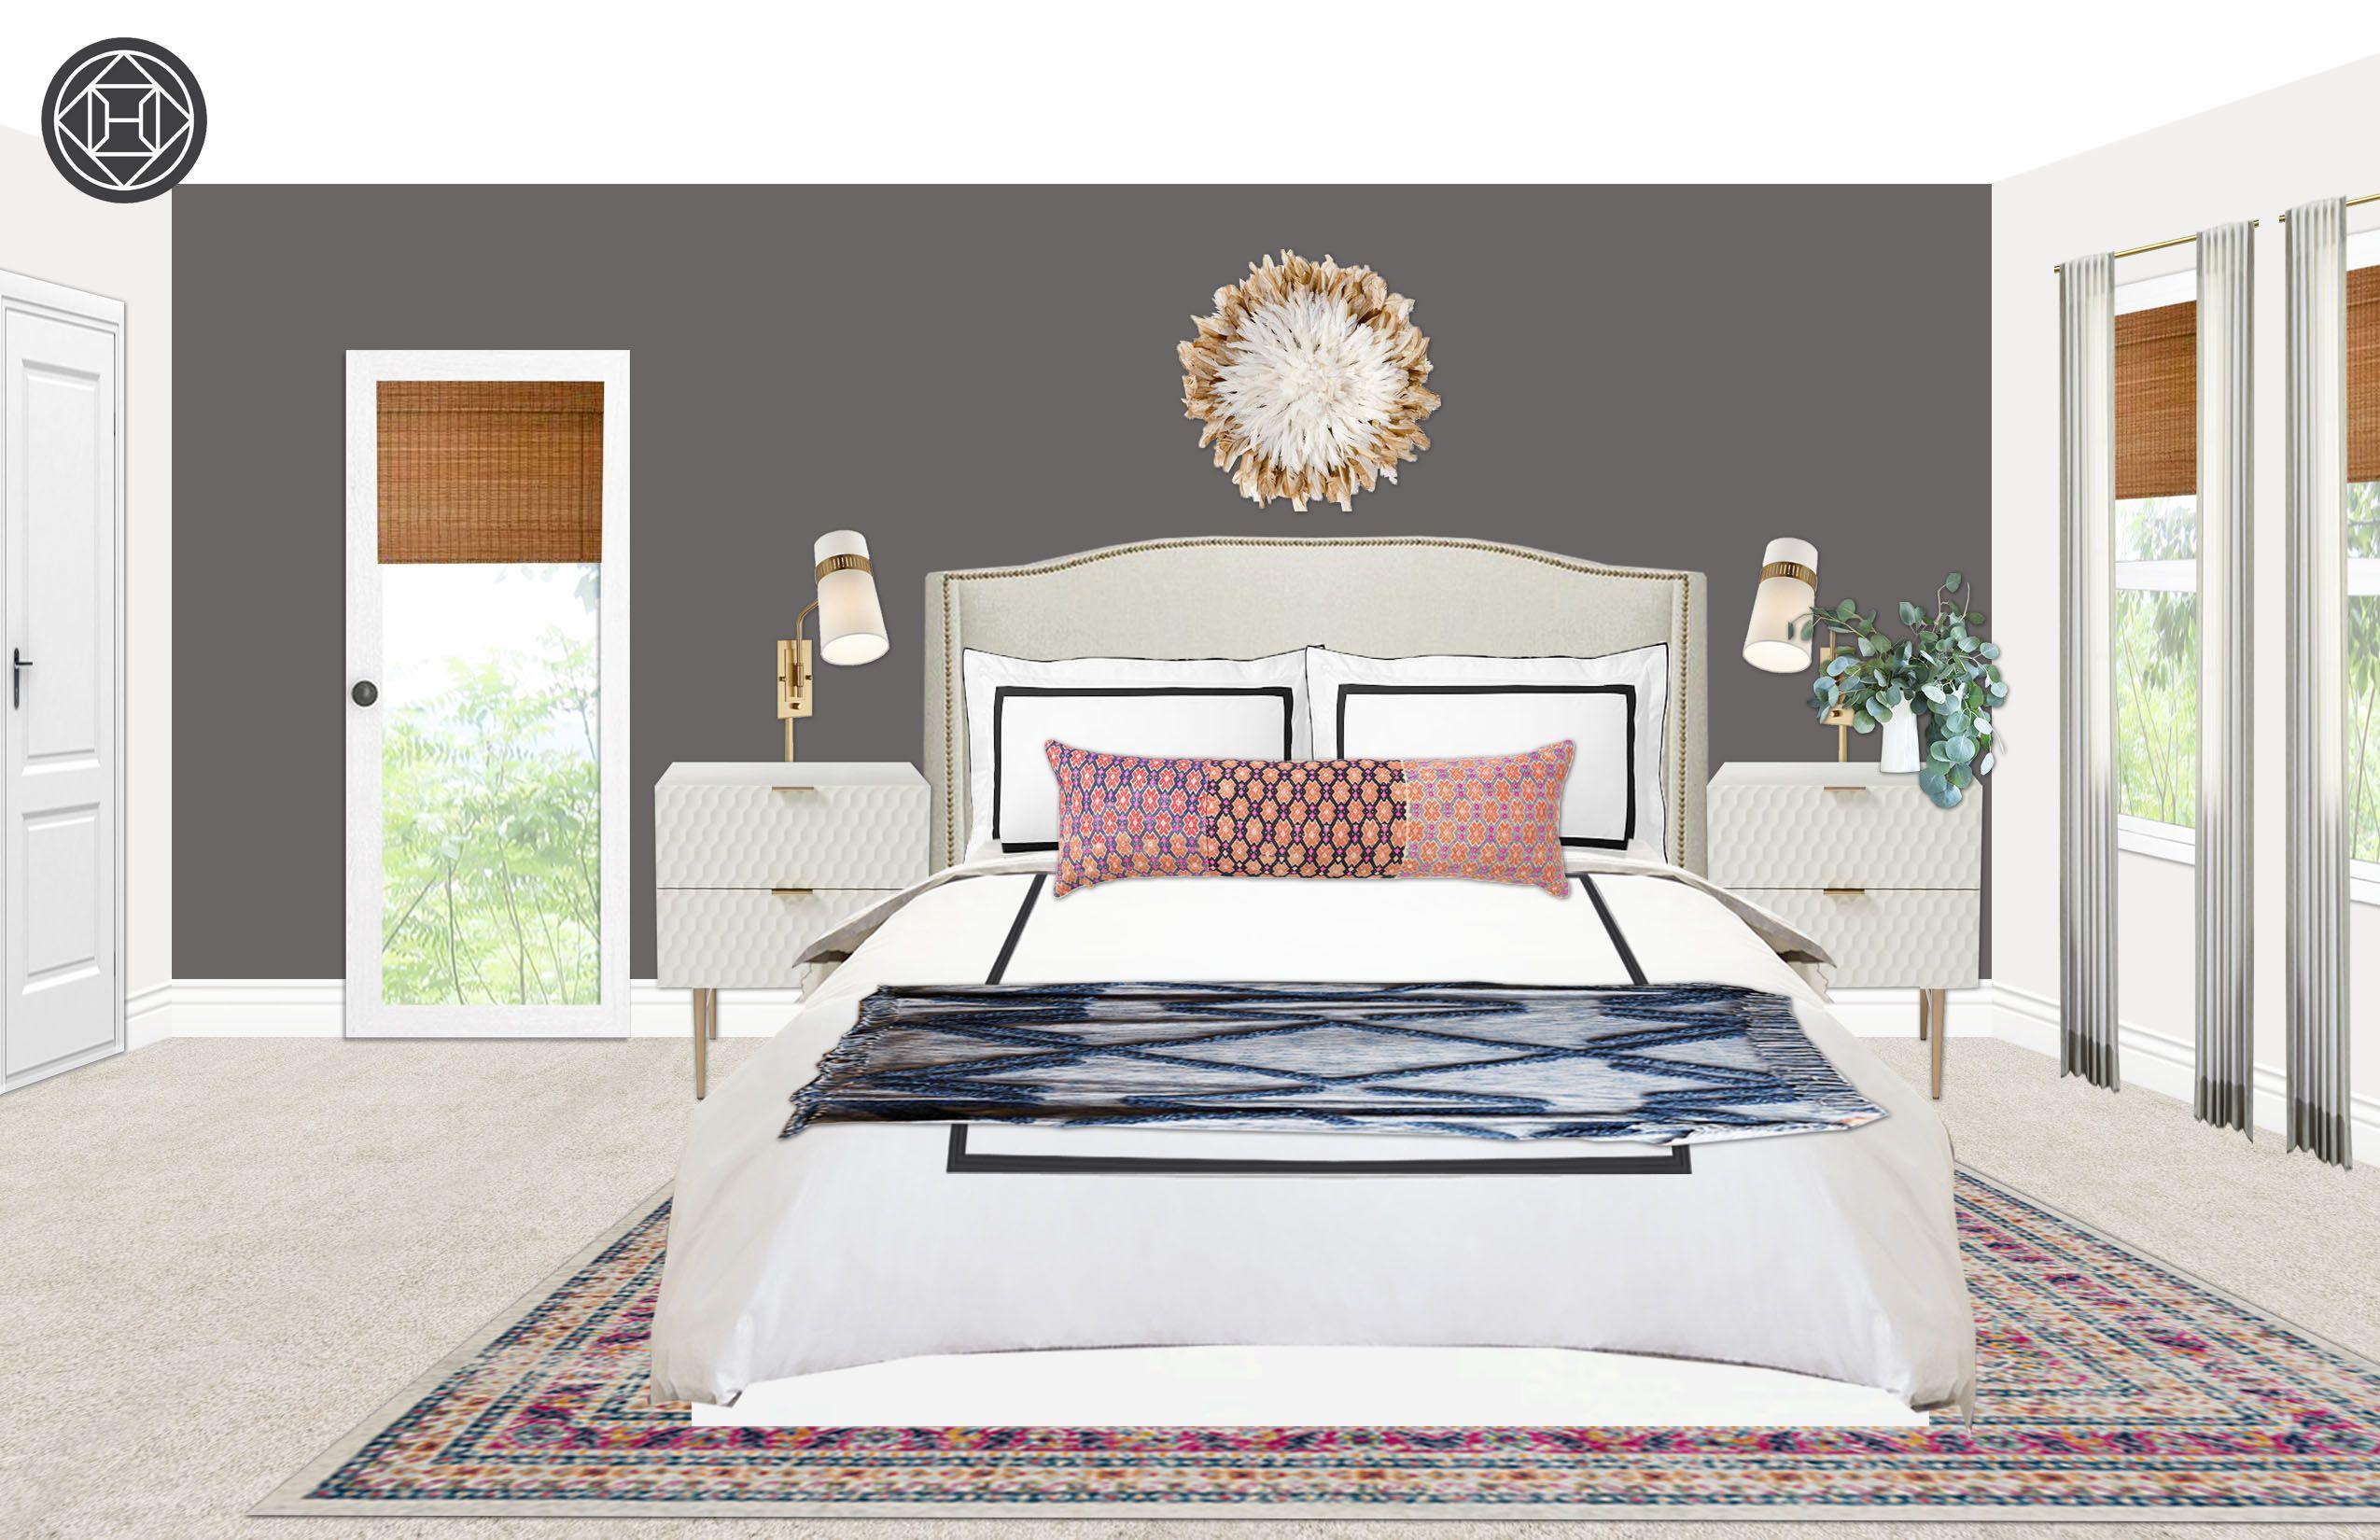 Bedroom Design By Havenly Interior Designer Michelle New Bedroom